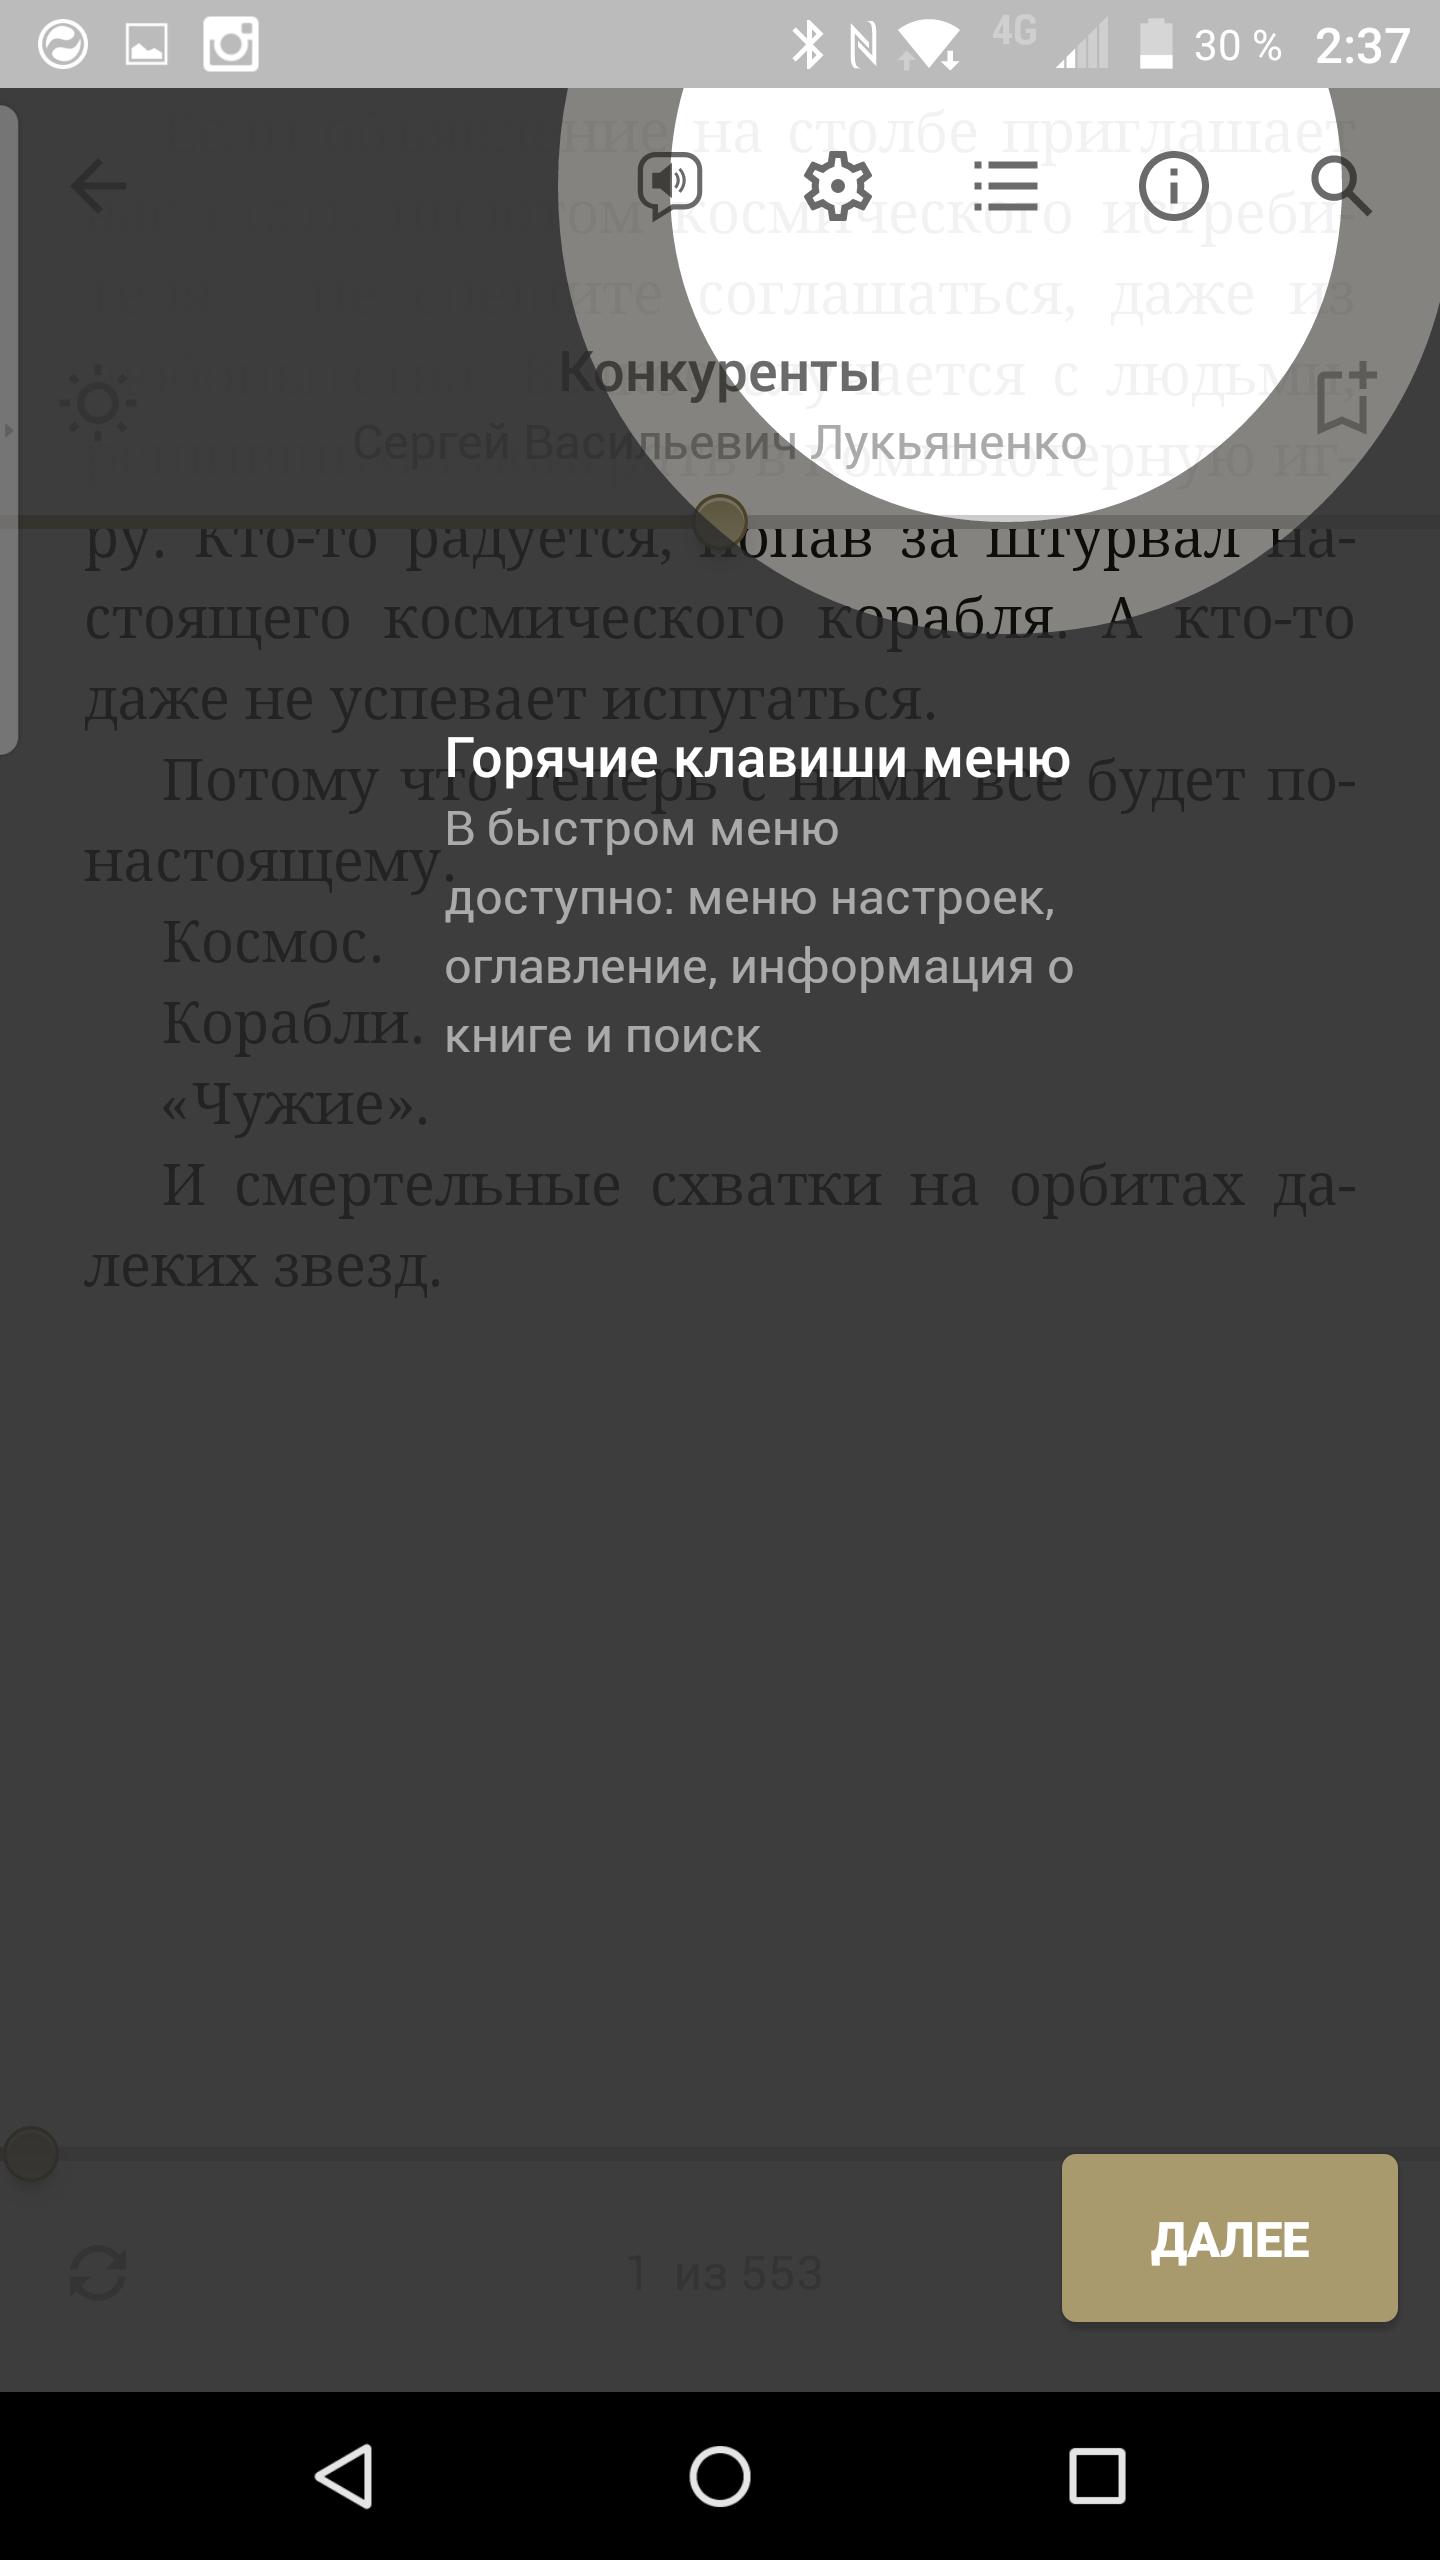 Screenshot_2016-01-18-02-37-48